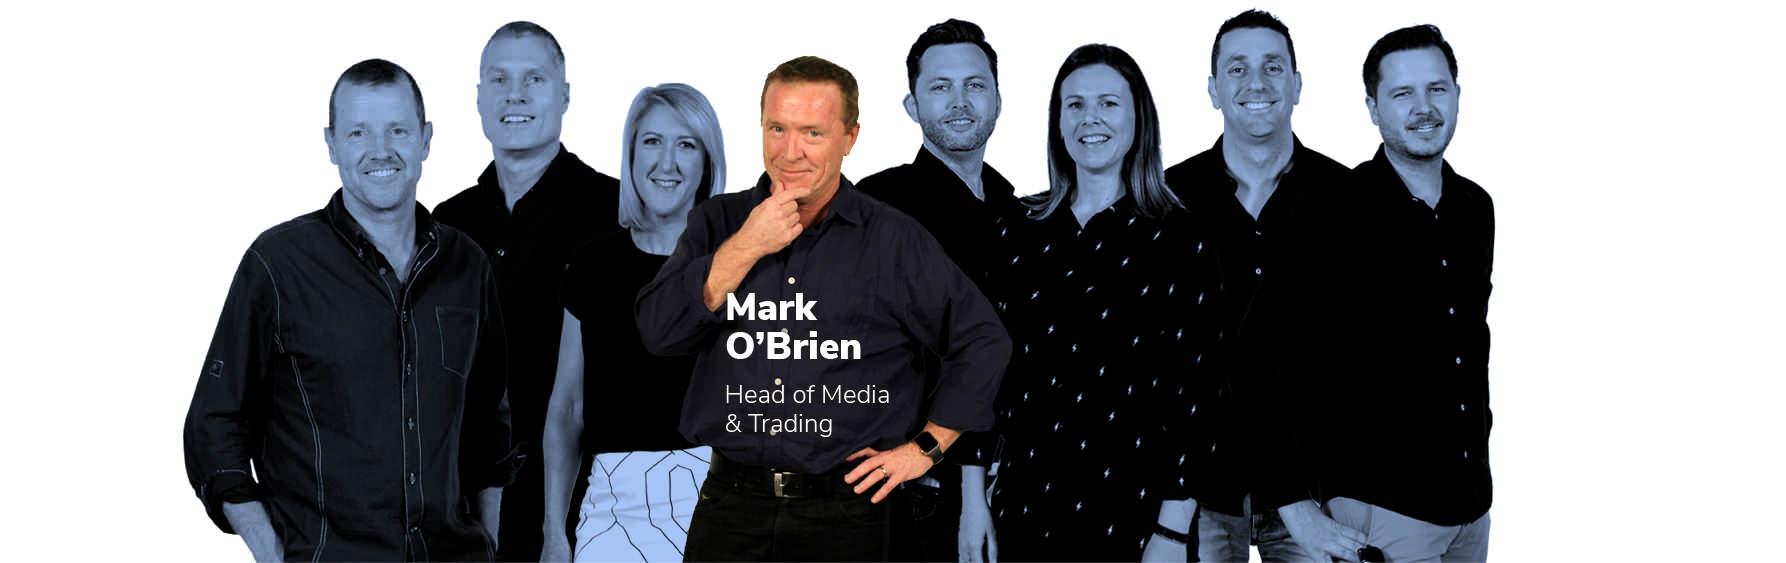 Mark O'Brien - Media Director